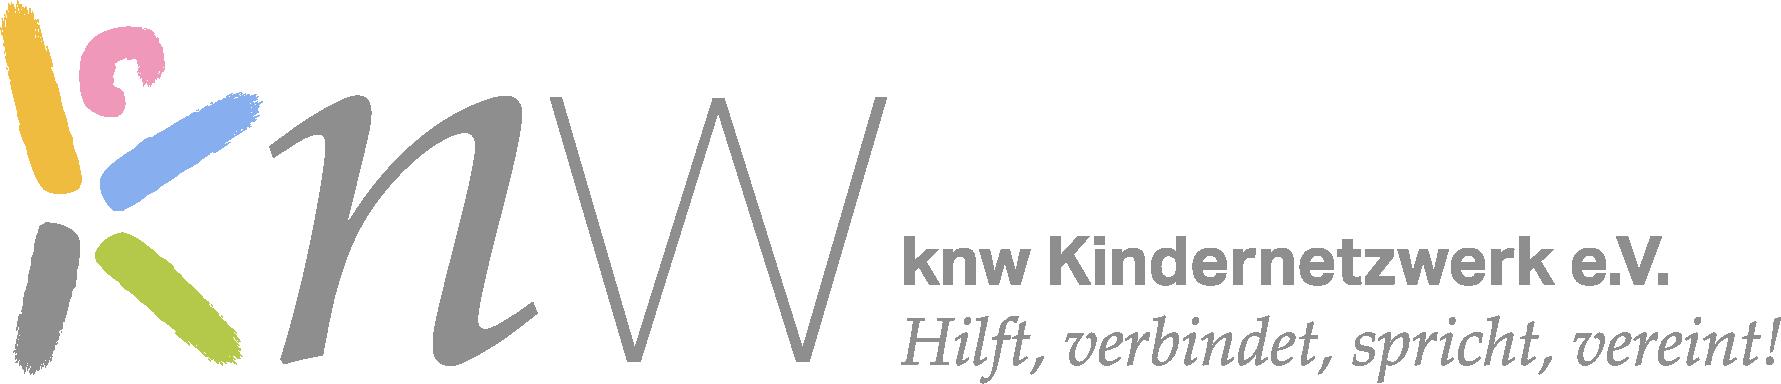 knidernetzwerk-banner1